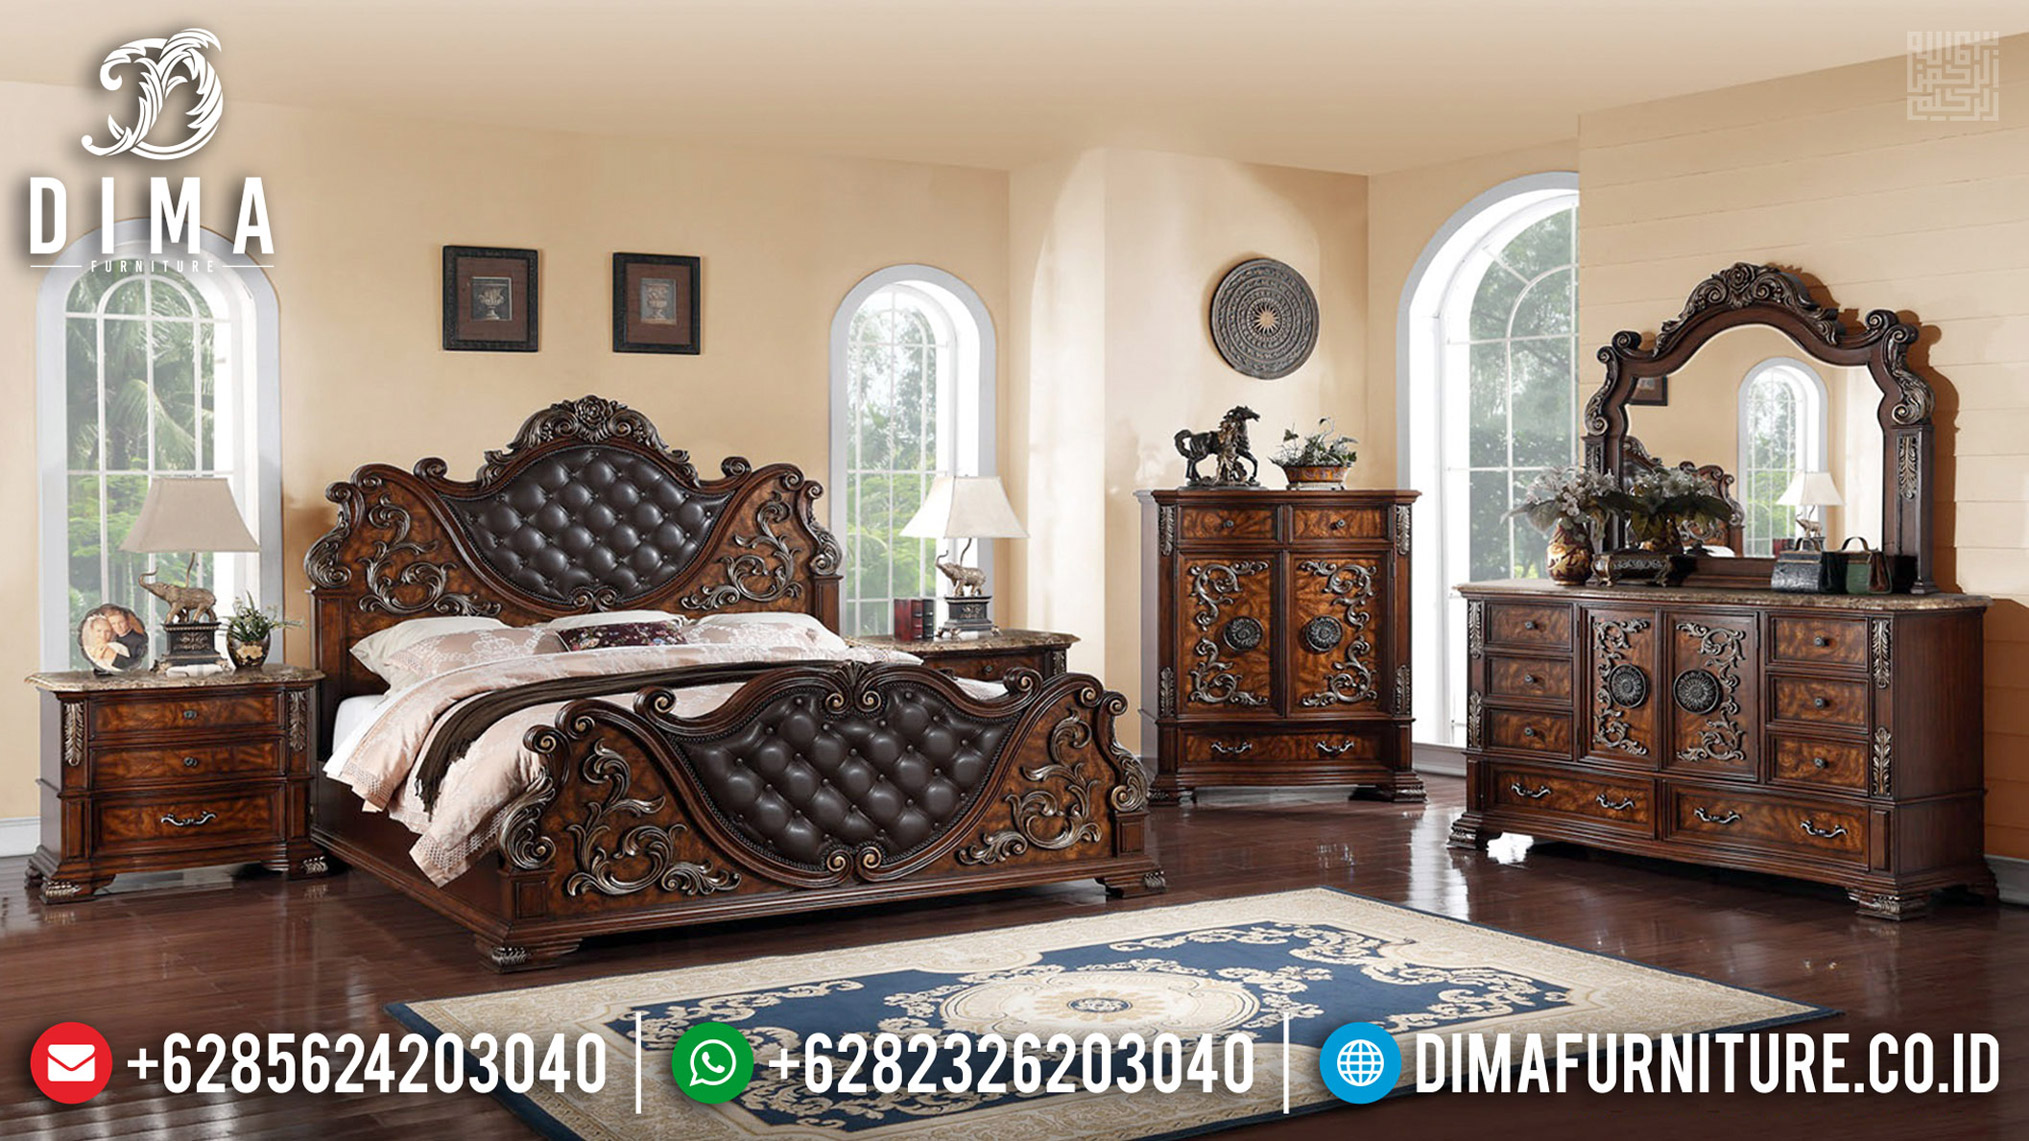 Jual Tempat Tidur Jati Klasik Ukiran Luxury Jepara Best Quality TTJ-0596